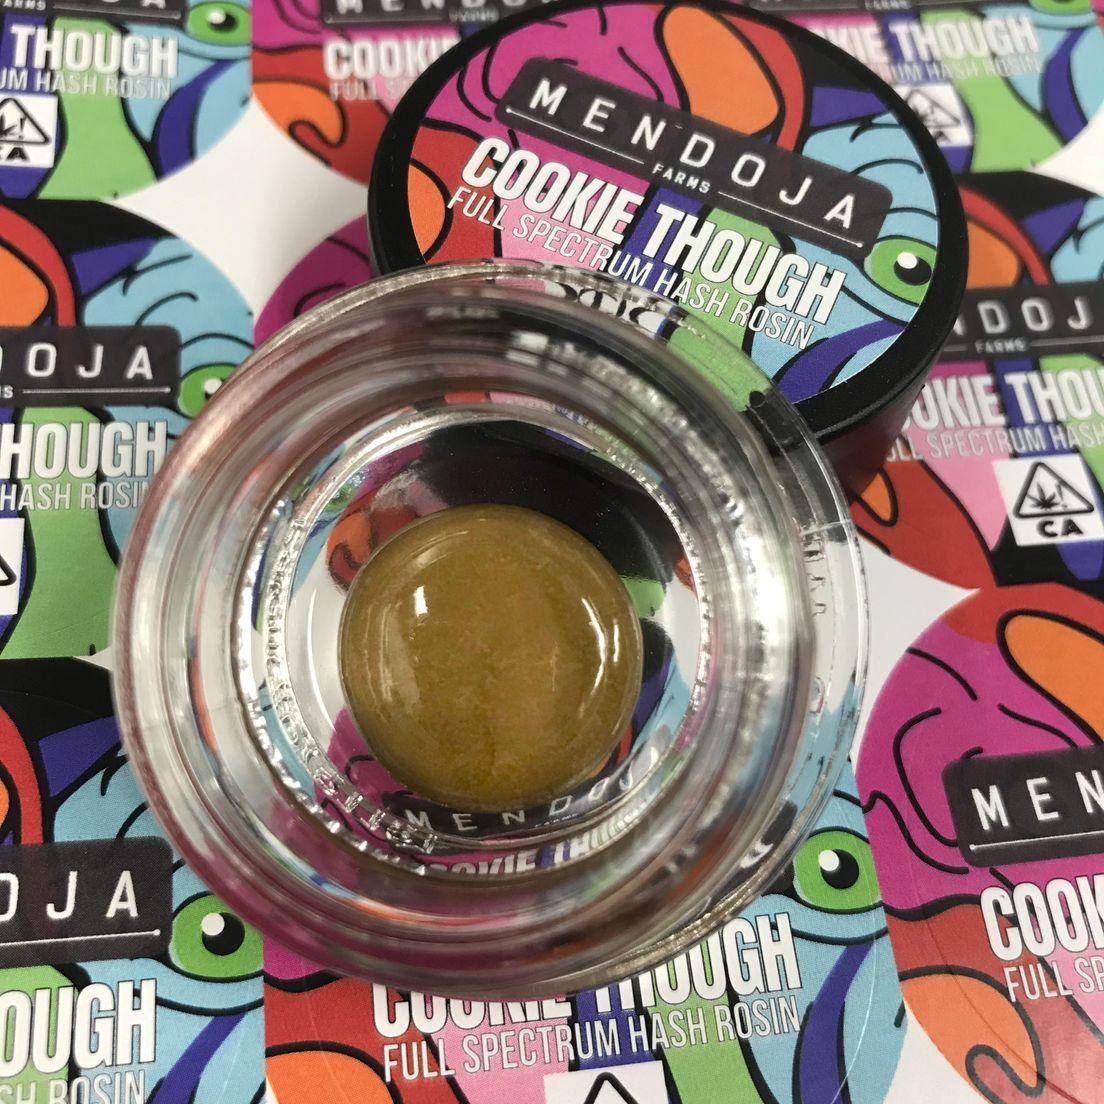 Honey Butter Cookie Though Full Spectrum Hash Rosin (1.0 g)